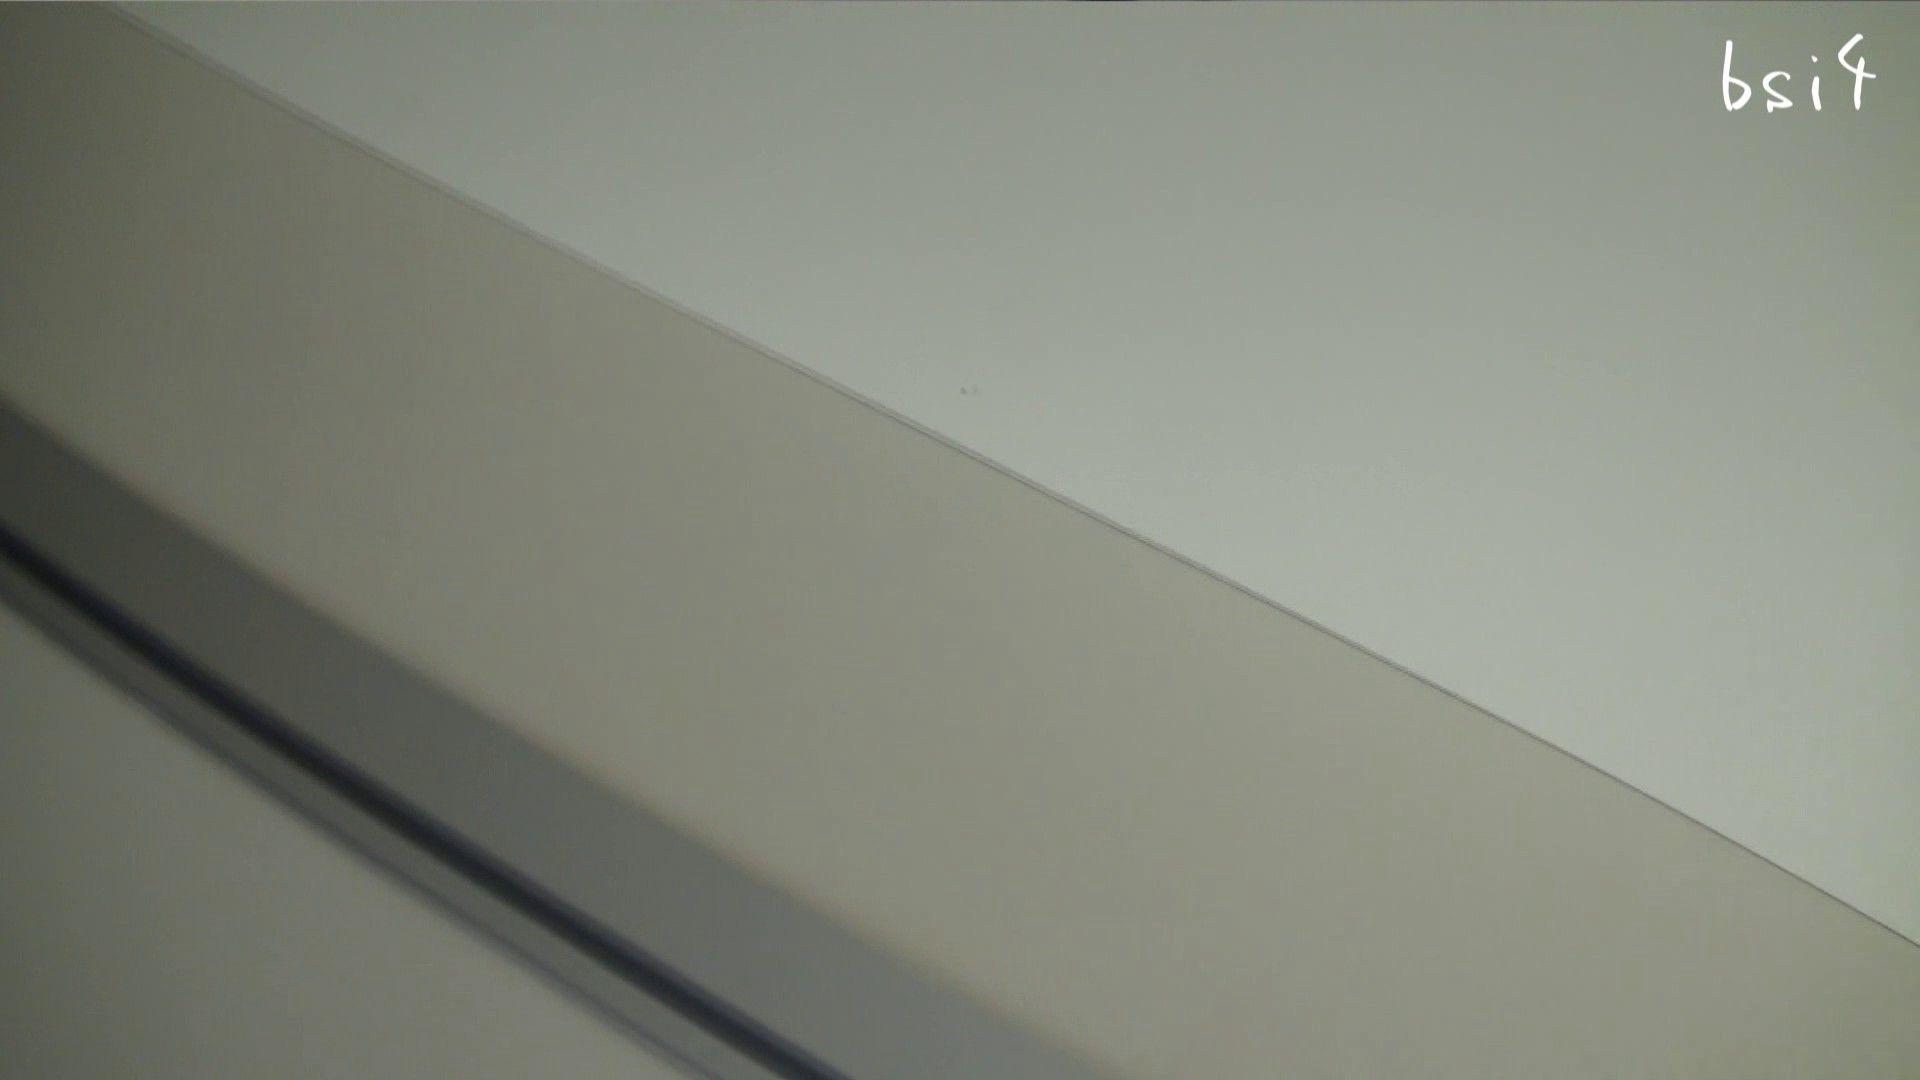 至高下半身盗撮-PREMIUM-【院内病棟編 】 vol.04 ナース ワレメ動画紹介 71PIX 3